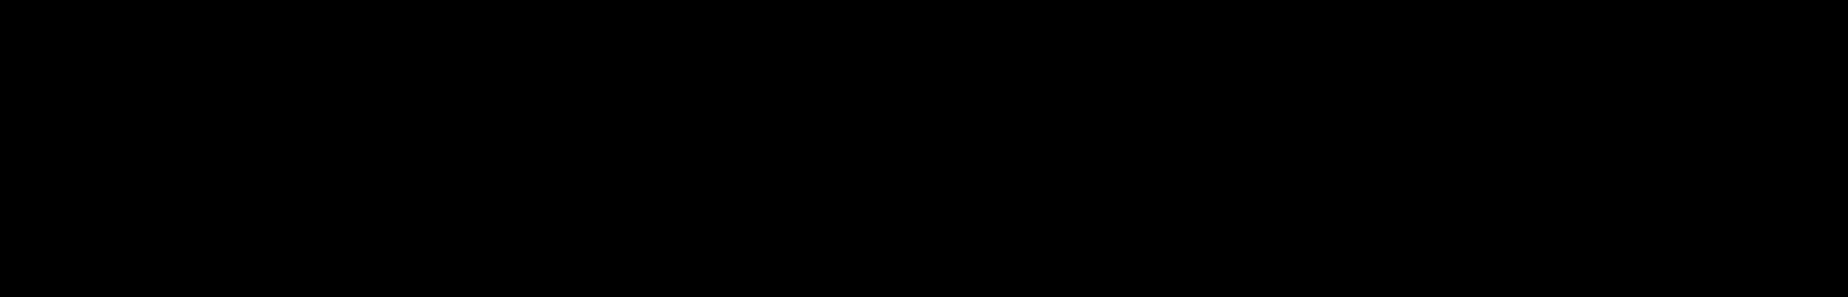 Capitol Lien Records & Research logo